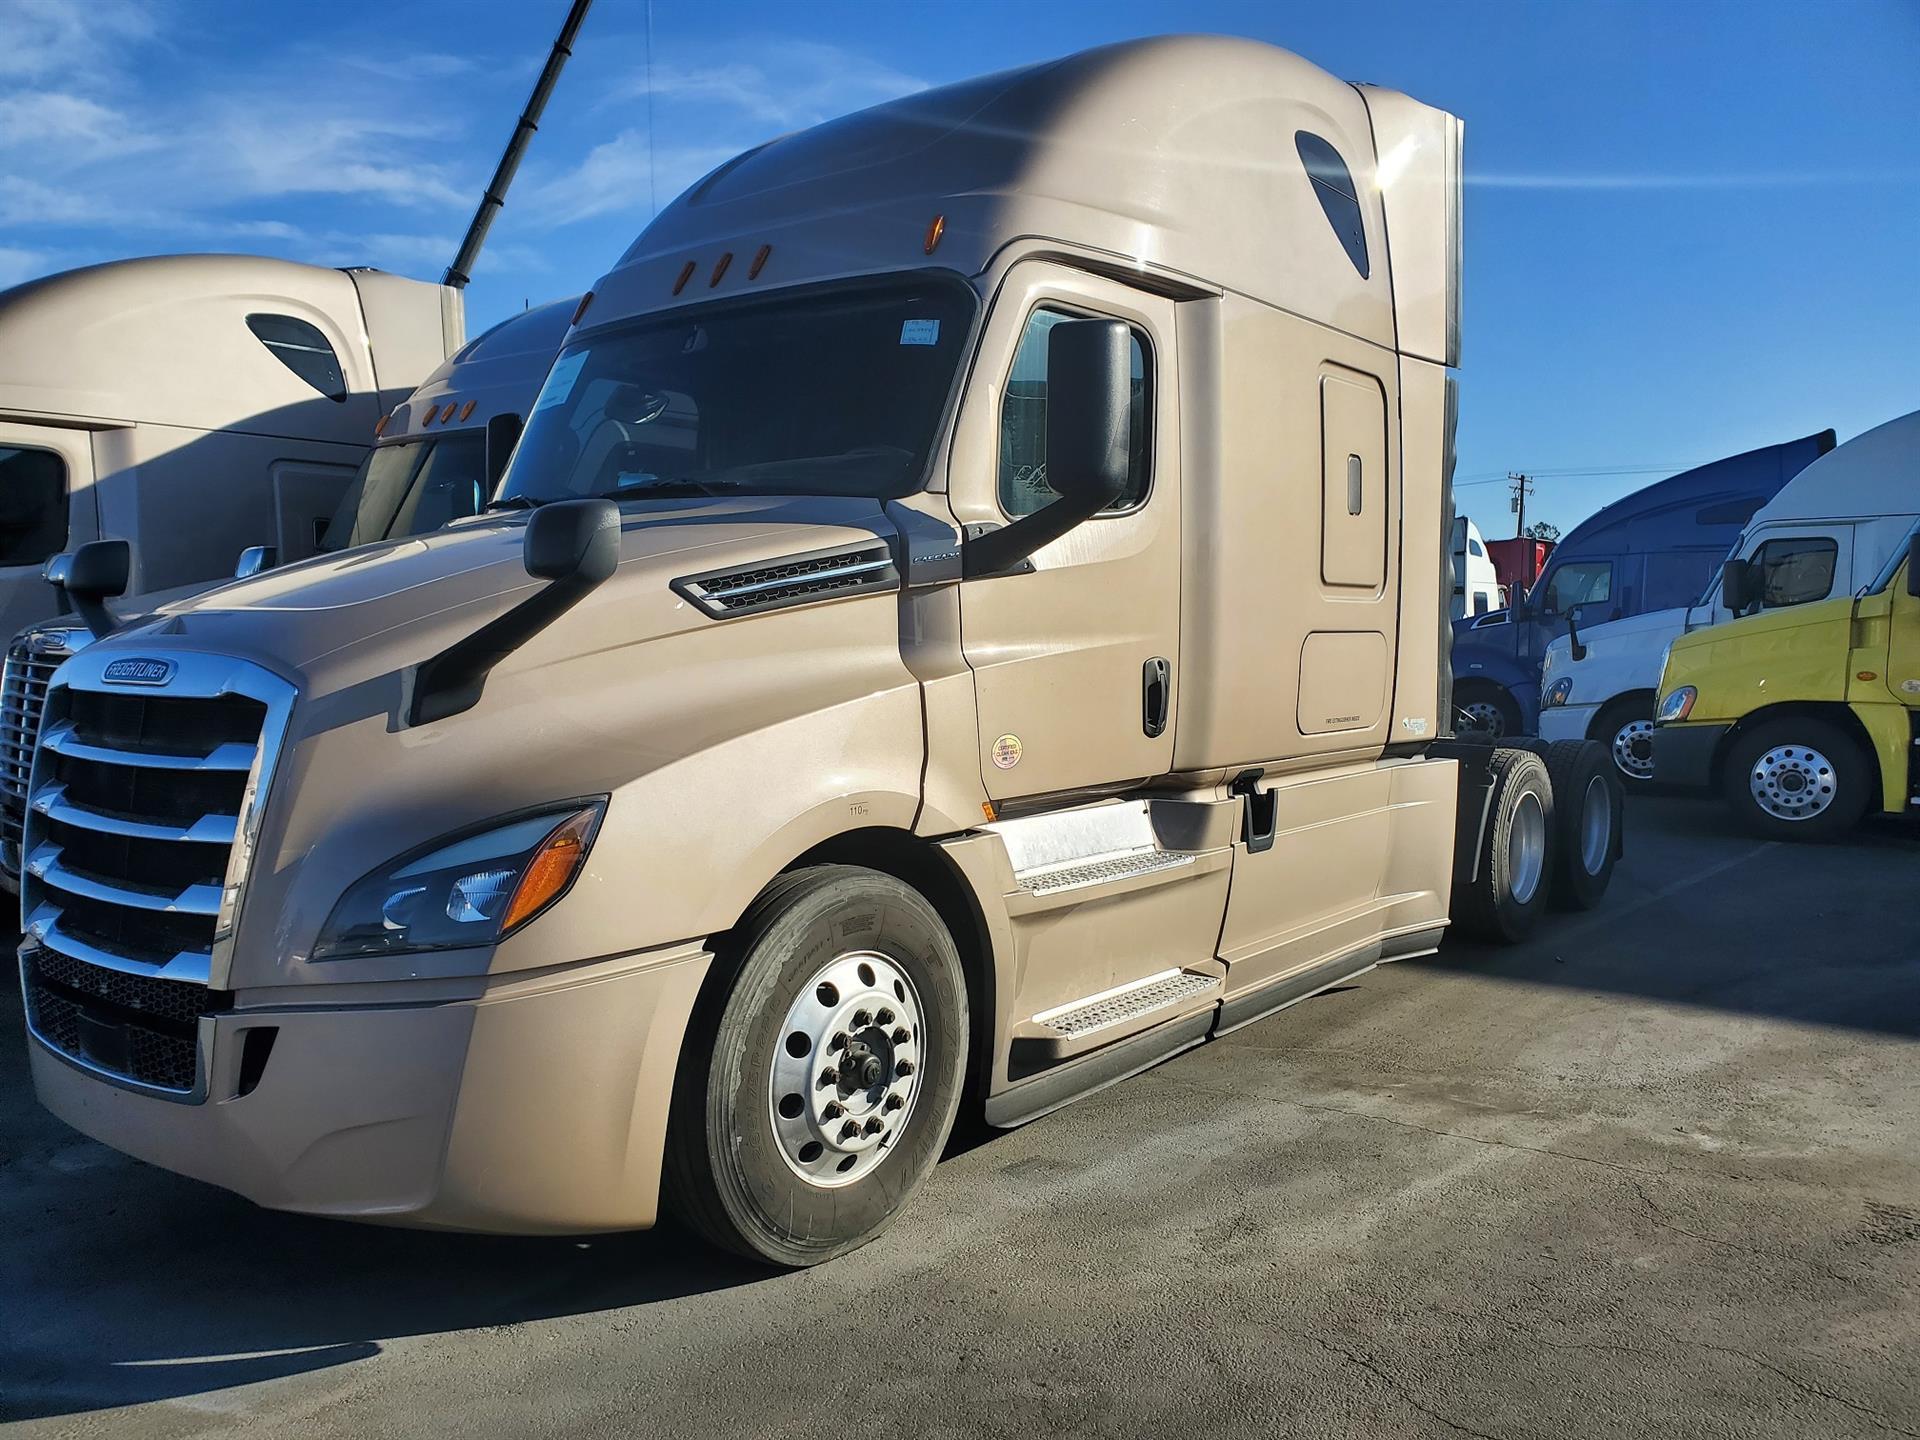 2019 Freightliner Cascadia Evolution